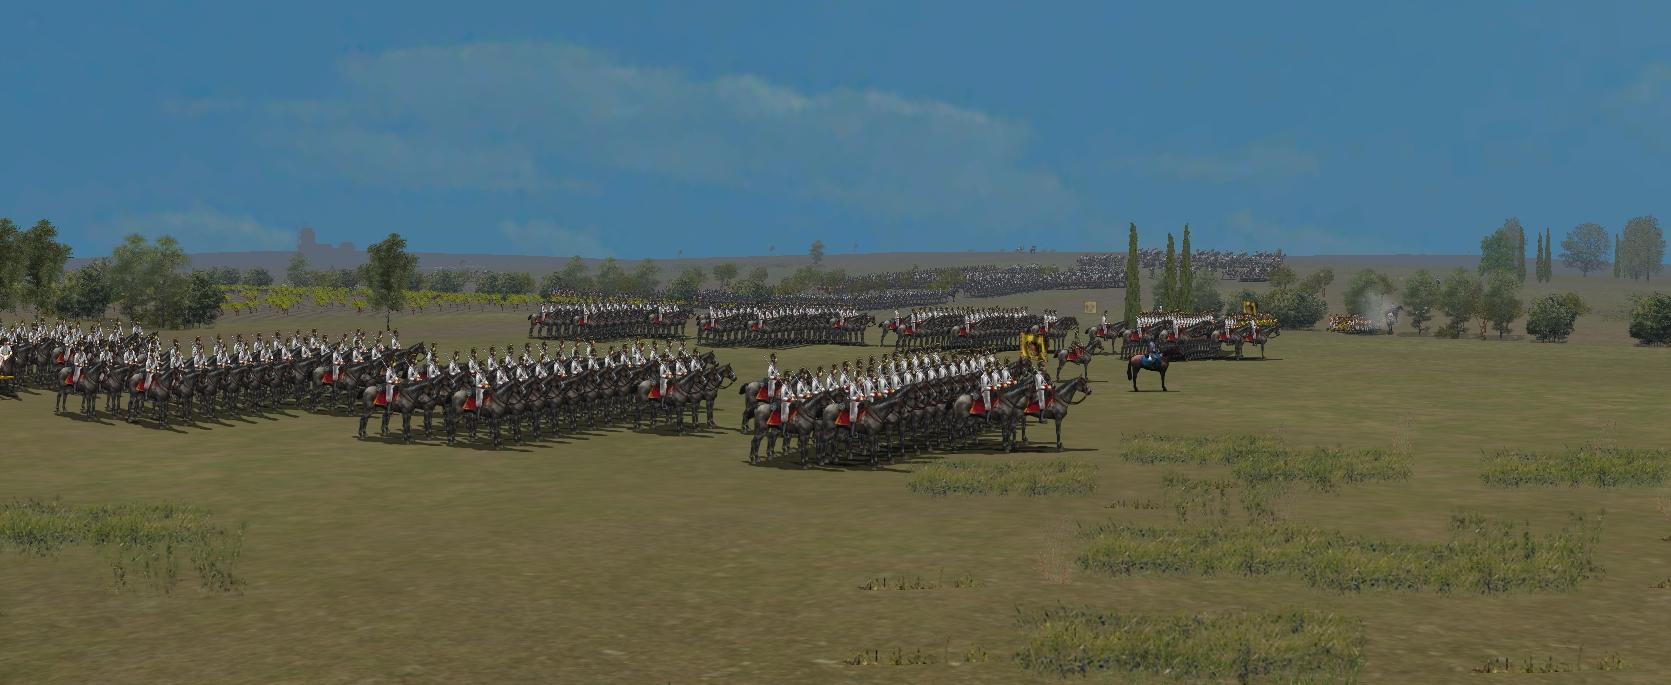 1805 Campaign on the Danube Screen0006